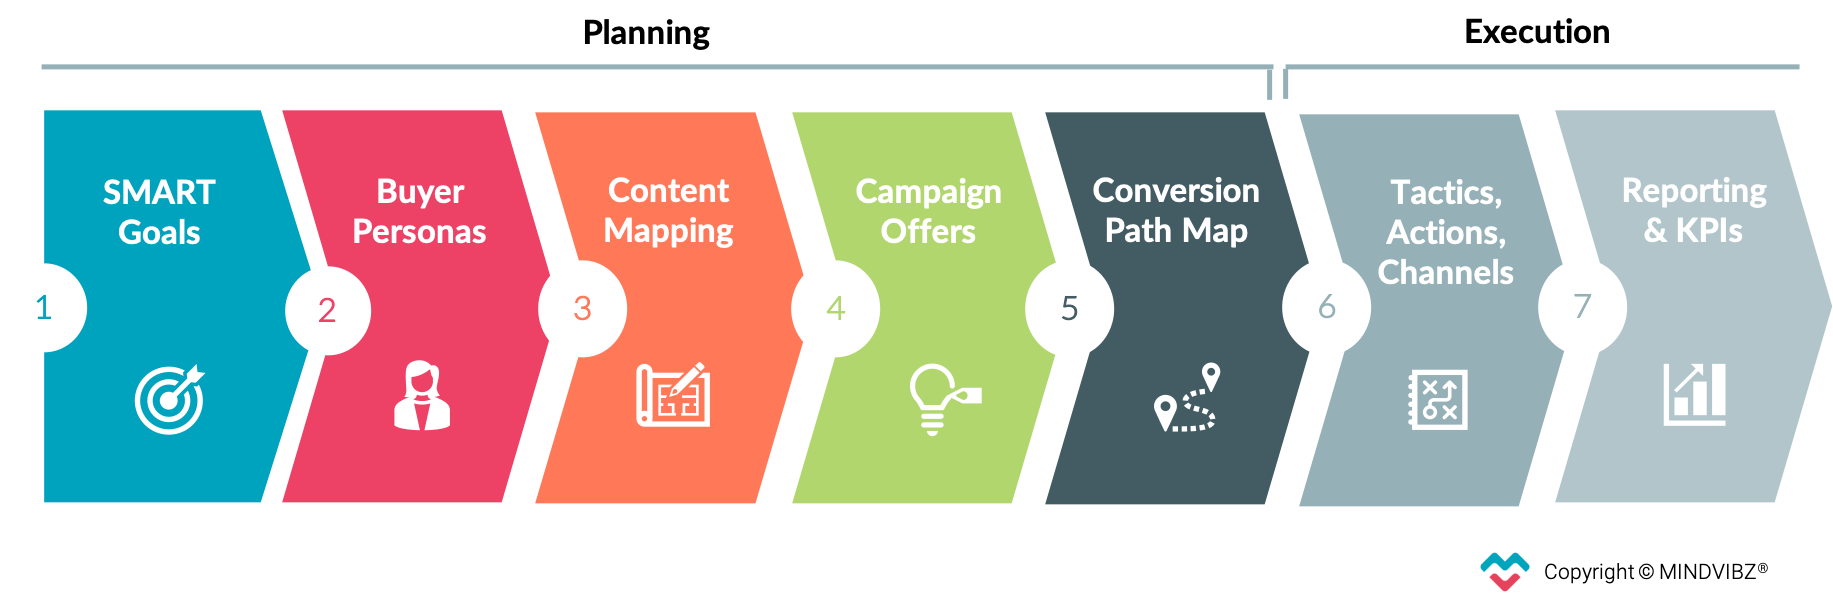 Marketing-Strategy-Blueprint-7-Steps